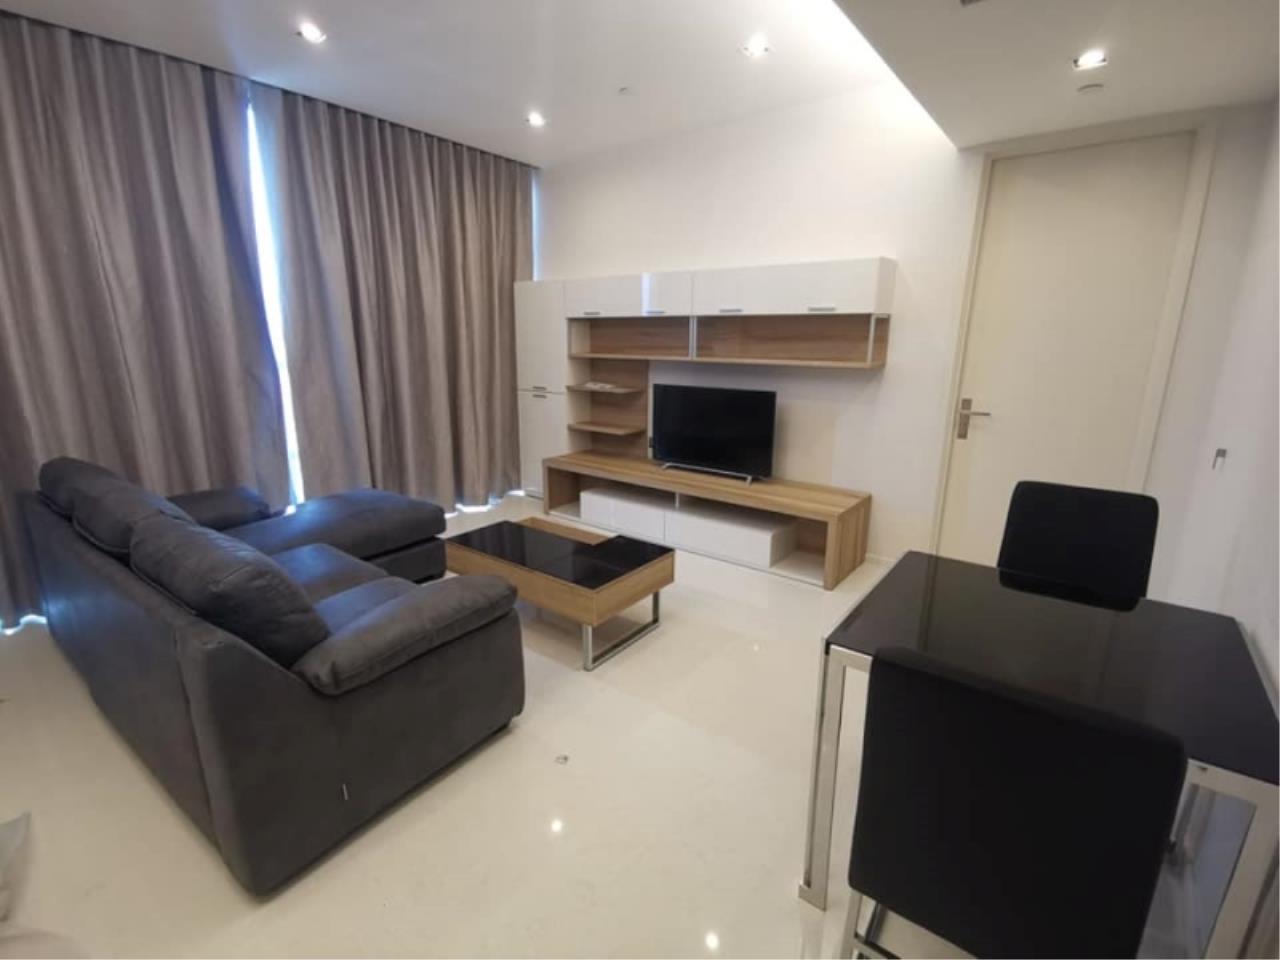 Century21 Skylux Agency's The Bangkok Sathorn / Condo For Rent / 1 Bedroom / 65 SQM / BTS Surasak / Bangkok 4